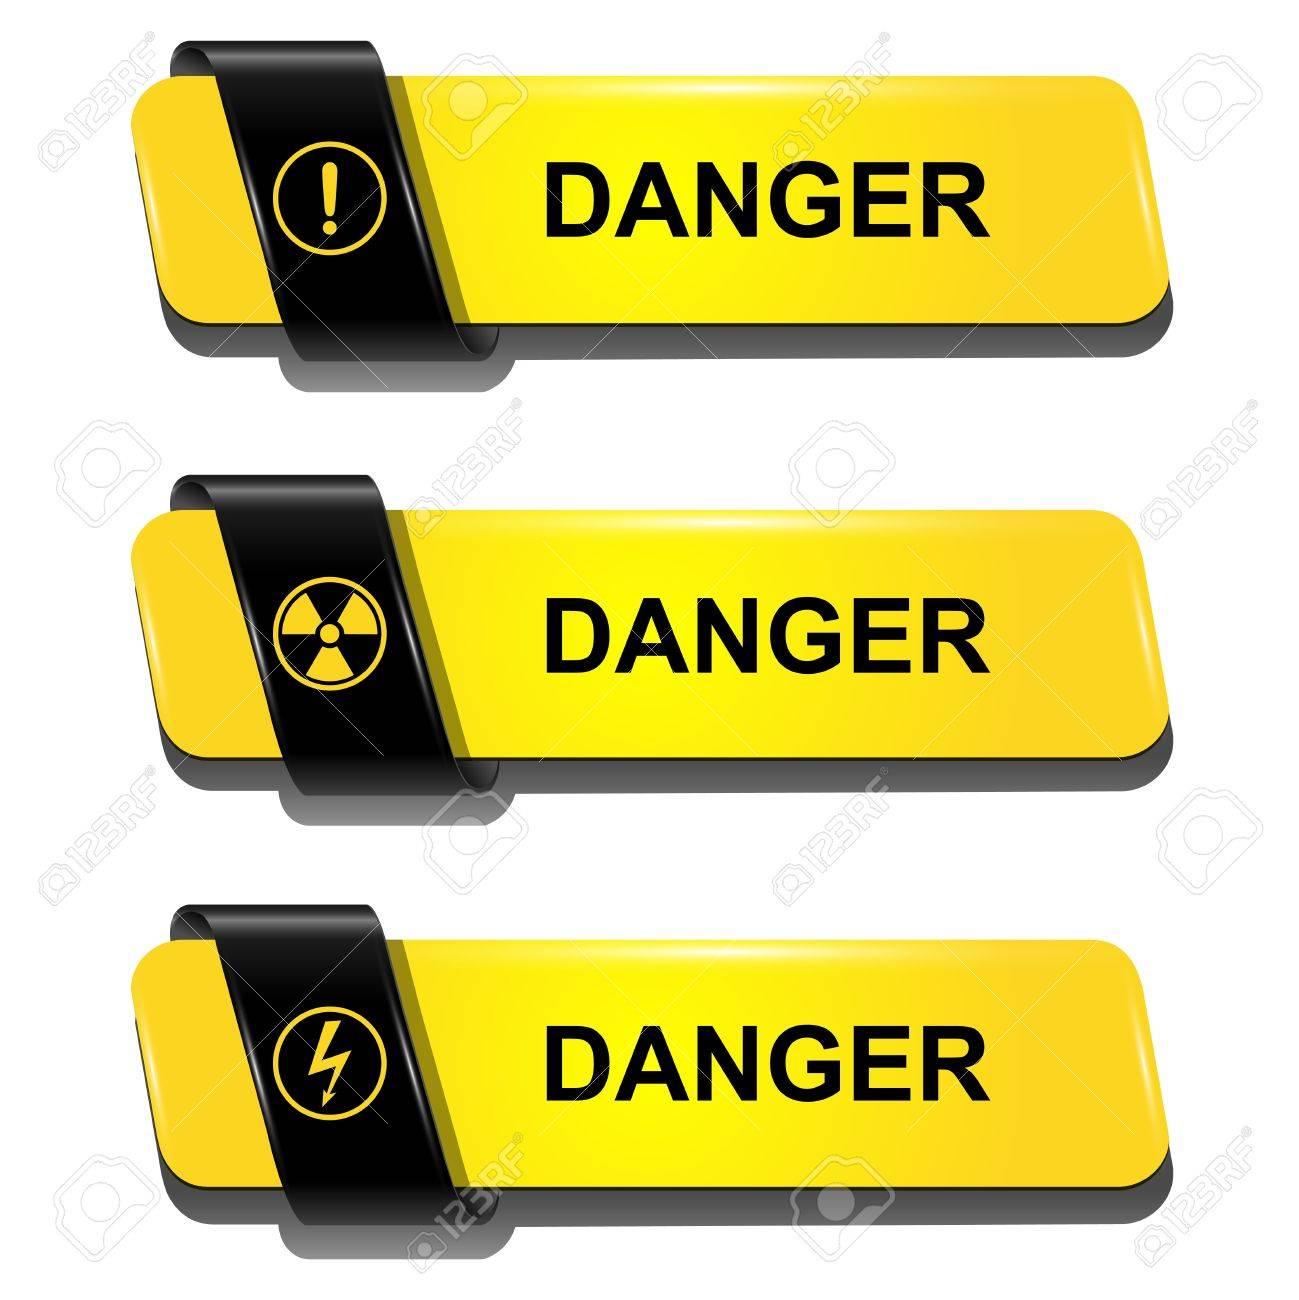 Danger buttons, signs vector set. Stock Vector - 19104915